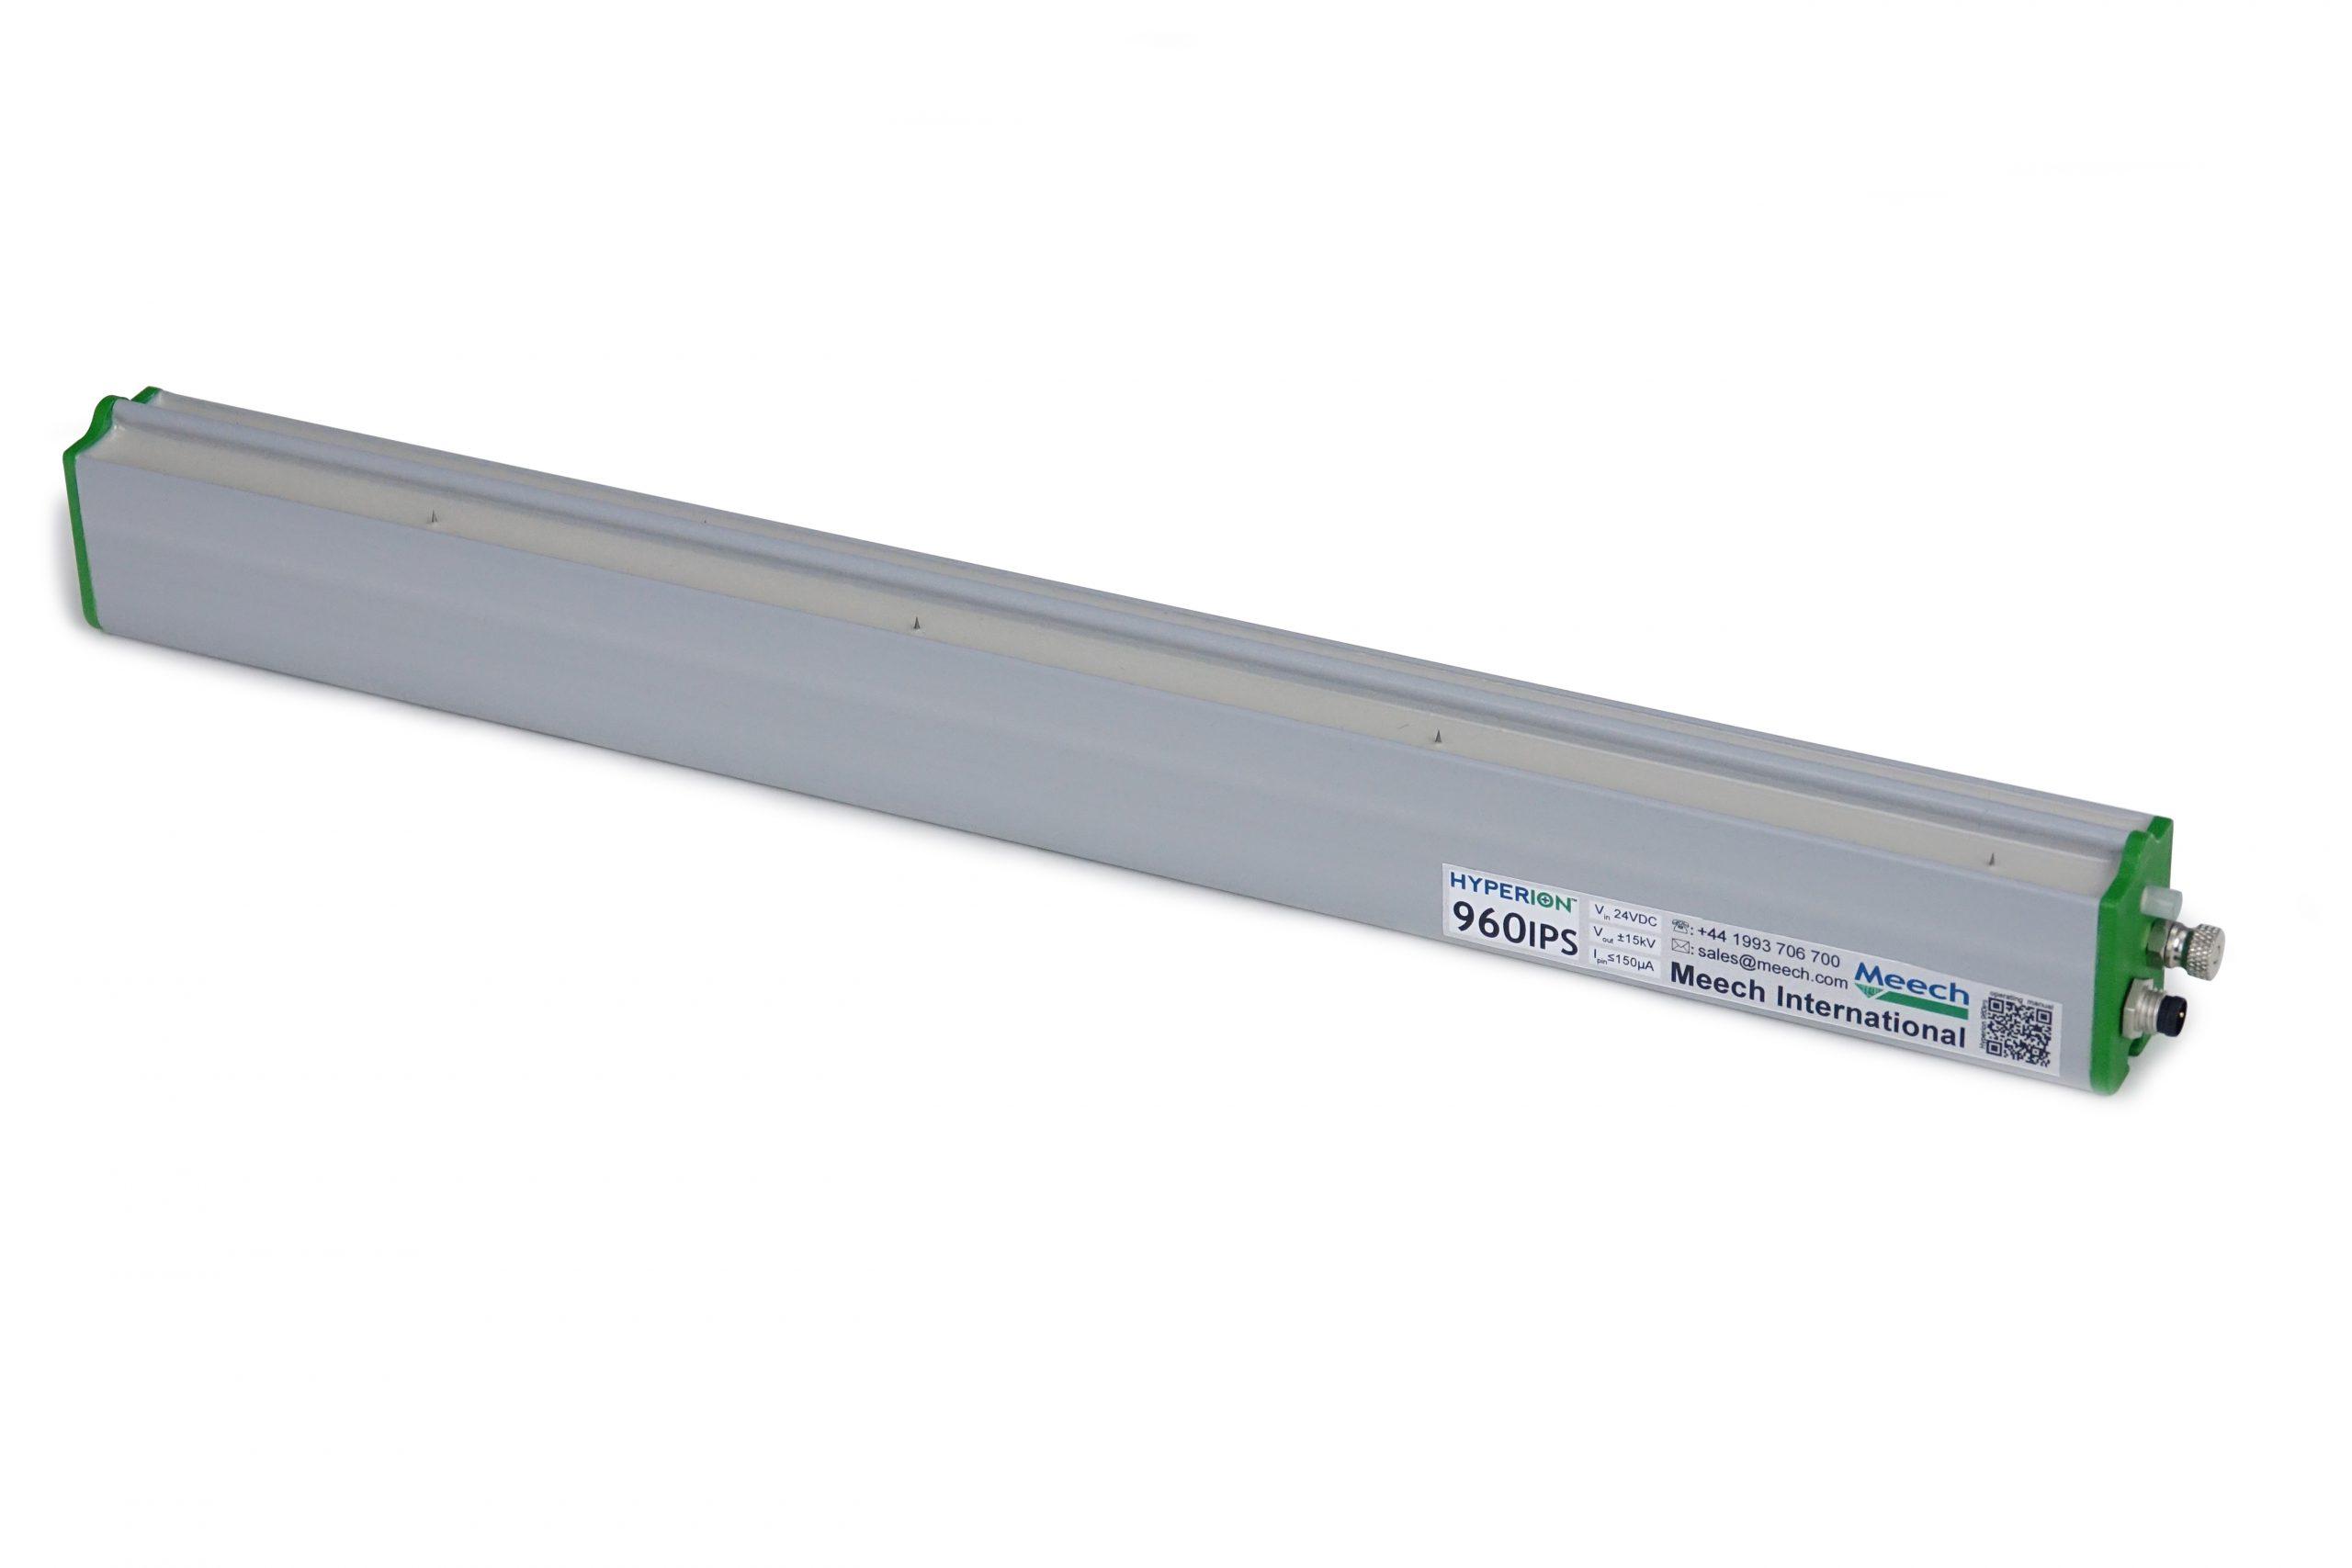 Hyperion 960IPS Mid-Range Ionising Bar